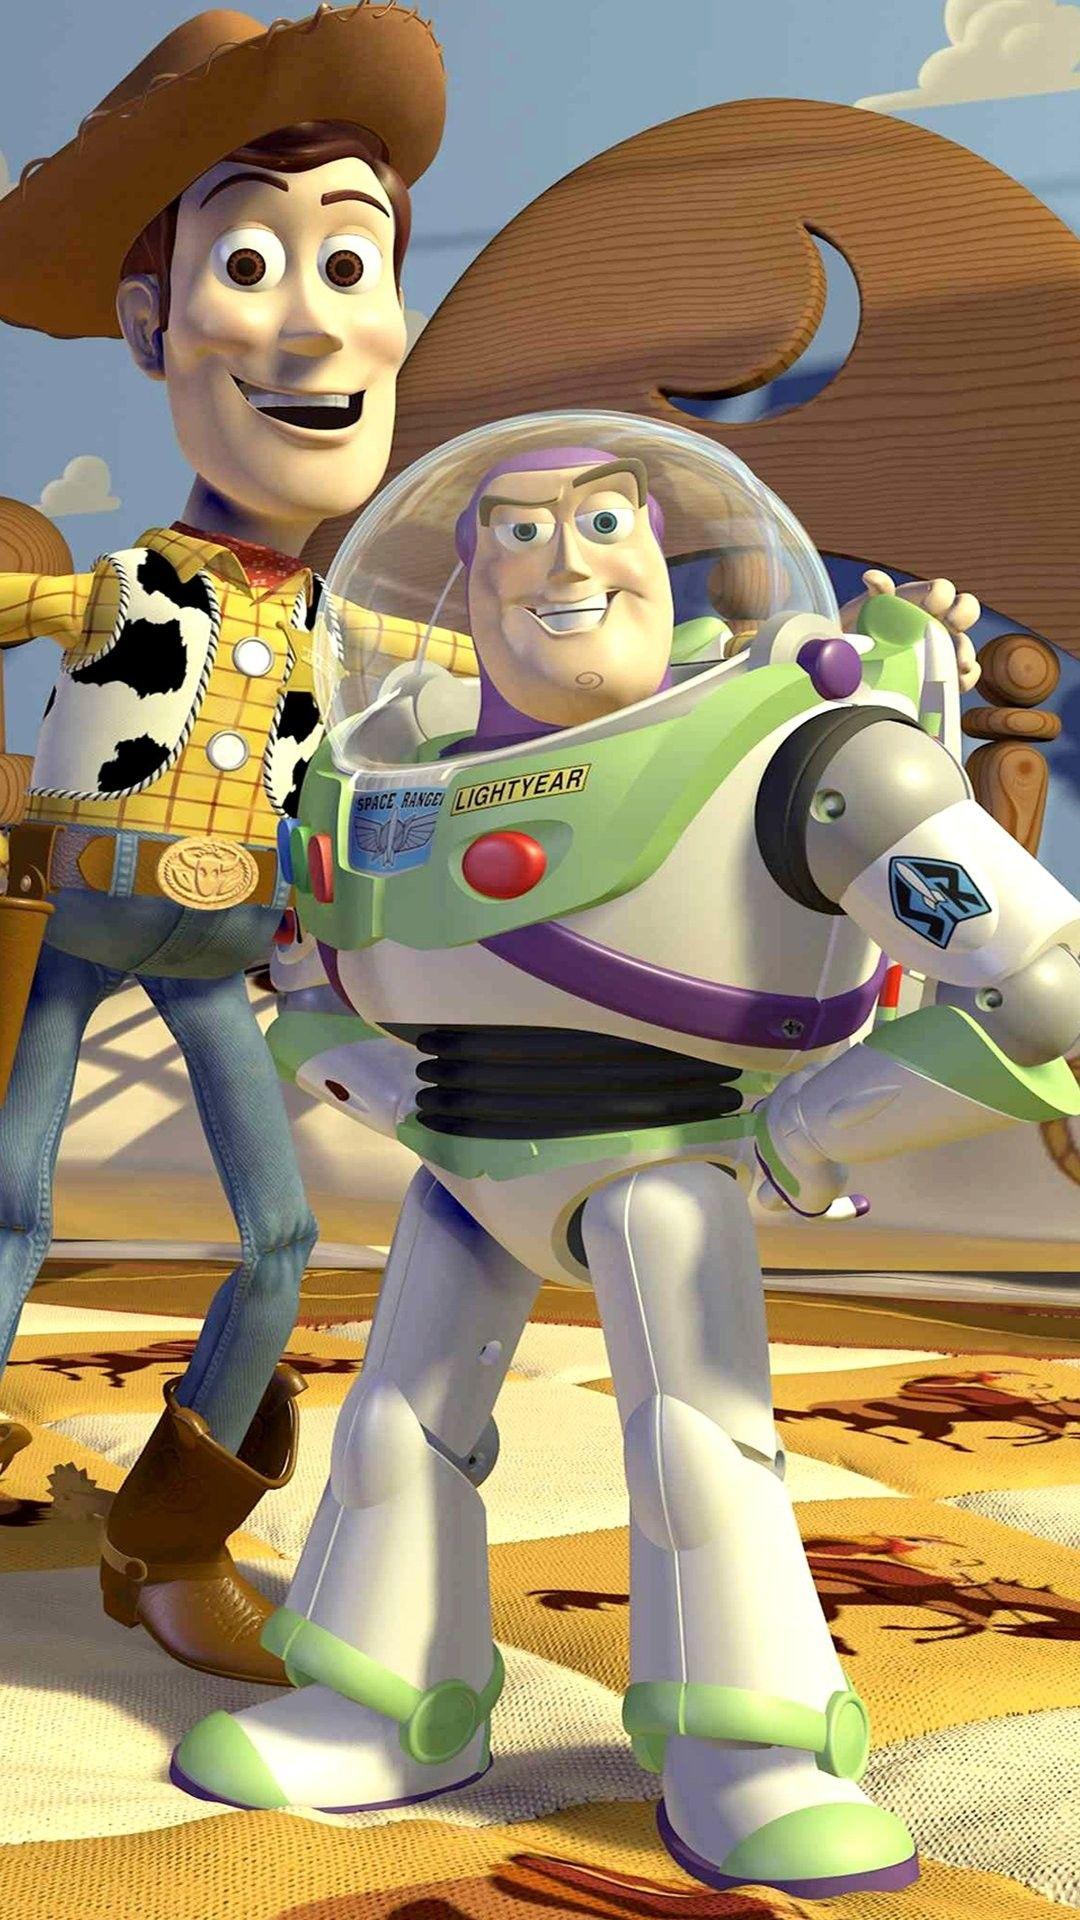 Toy Story Iphone 6 Plus Wallpaper 13288 Movies Iphone 6 Plus Wallpapers Movies Iphone 6 Plus Wall Animationsfilme Disney Spielzeug Lustige Kinderbilder